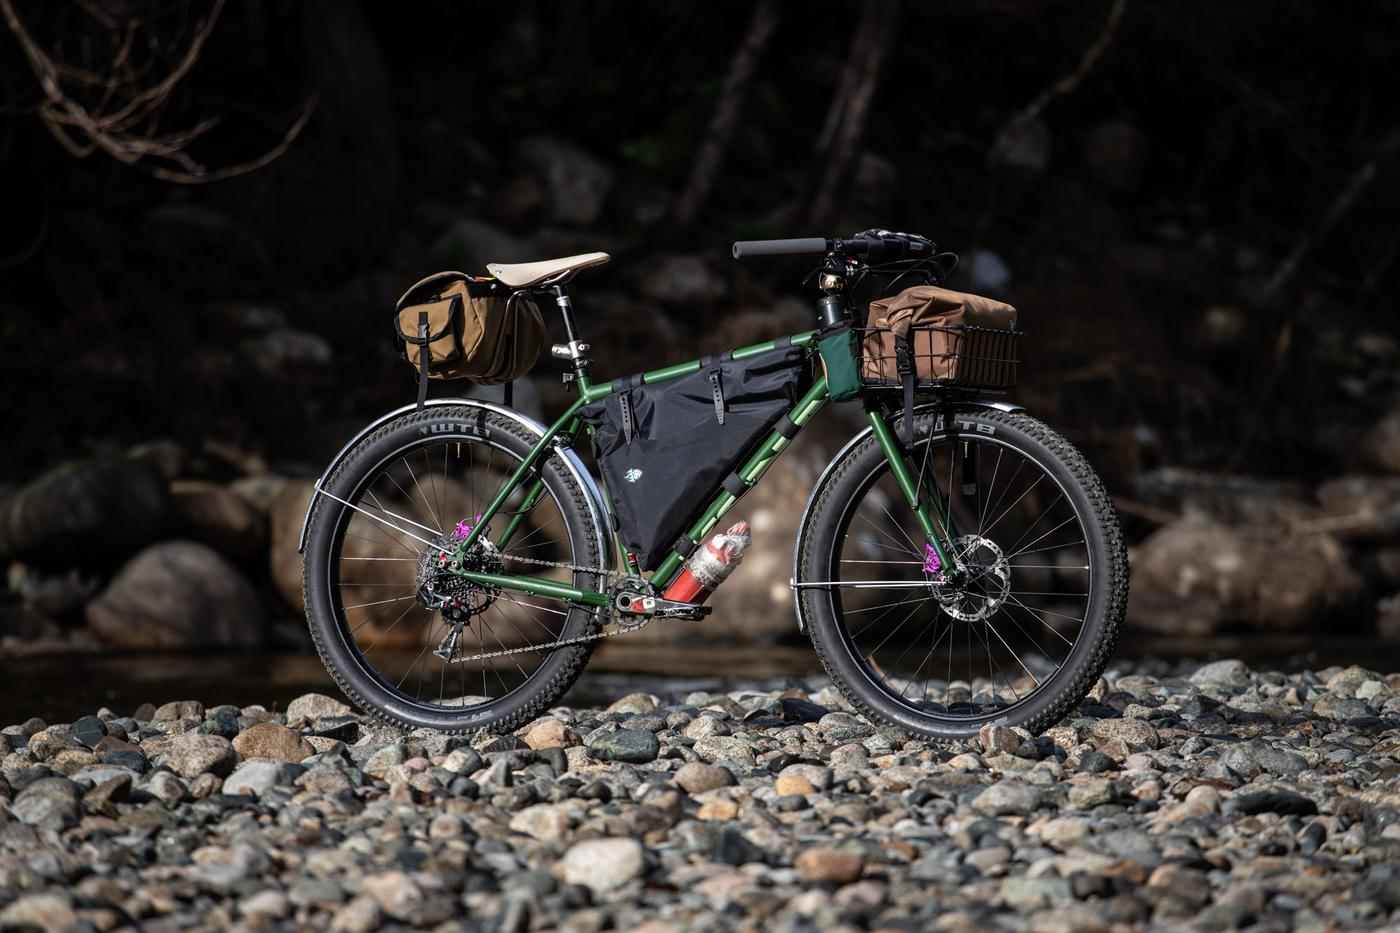 Morgan's Kona Unit Basketpacker:The Bike I Almost Sold